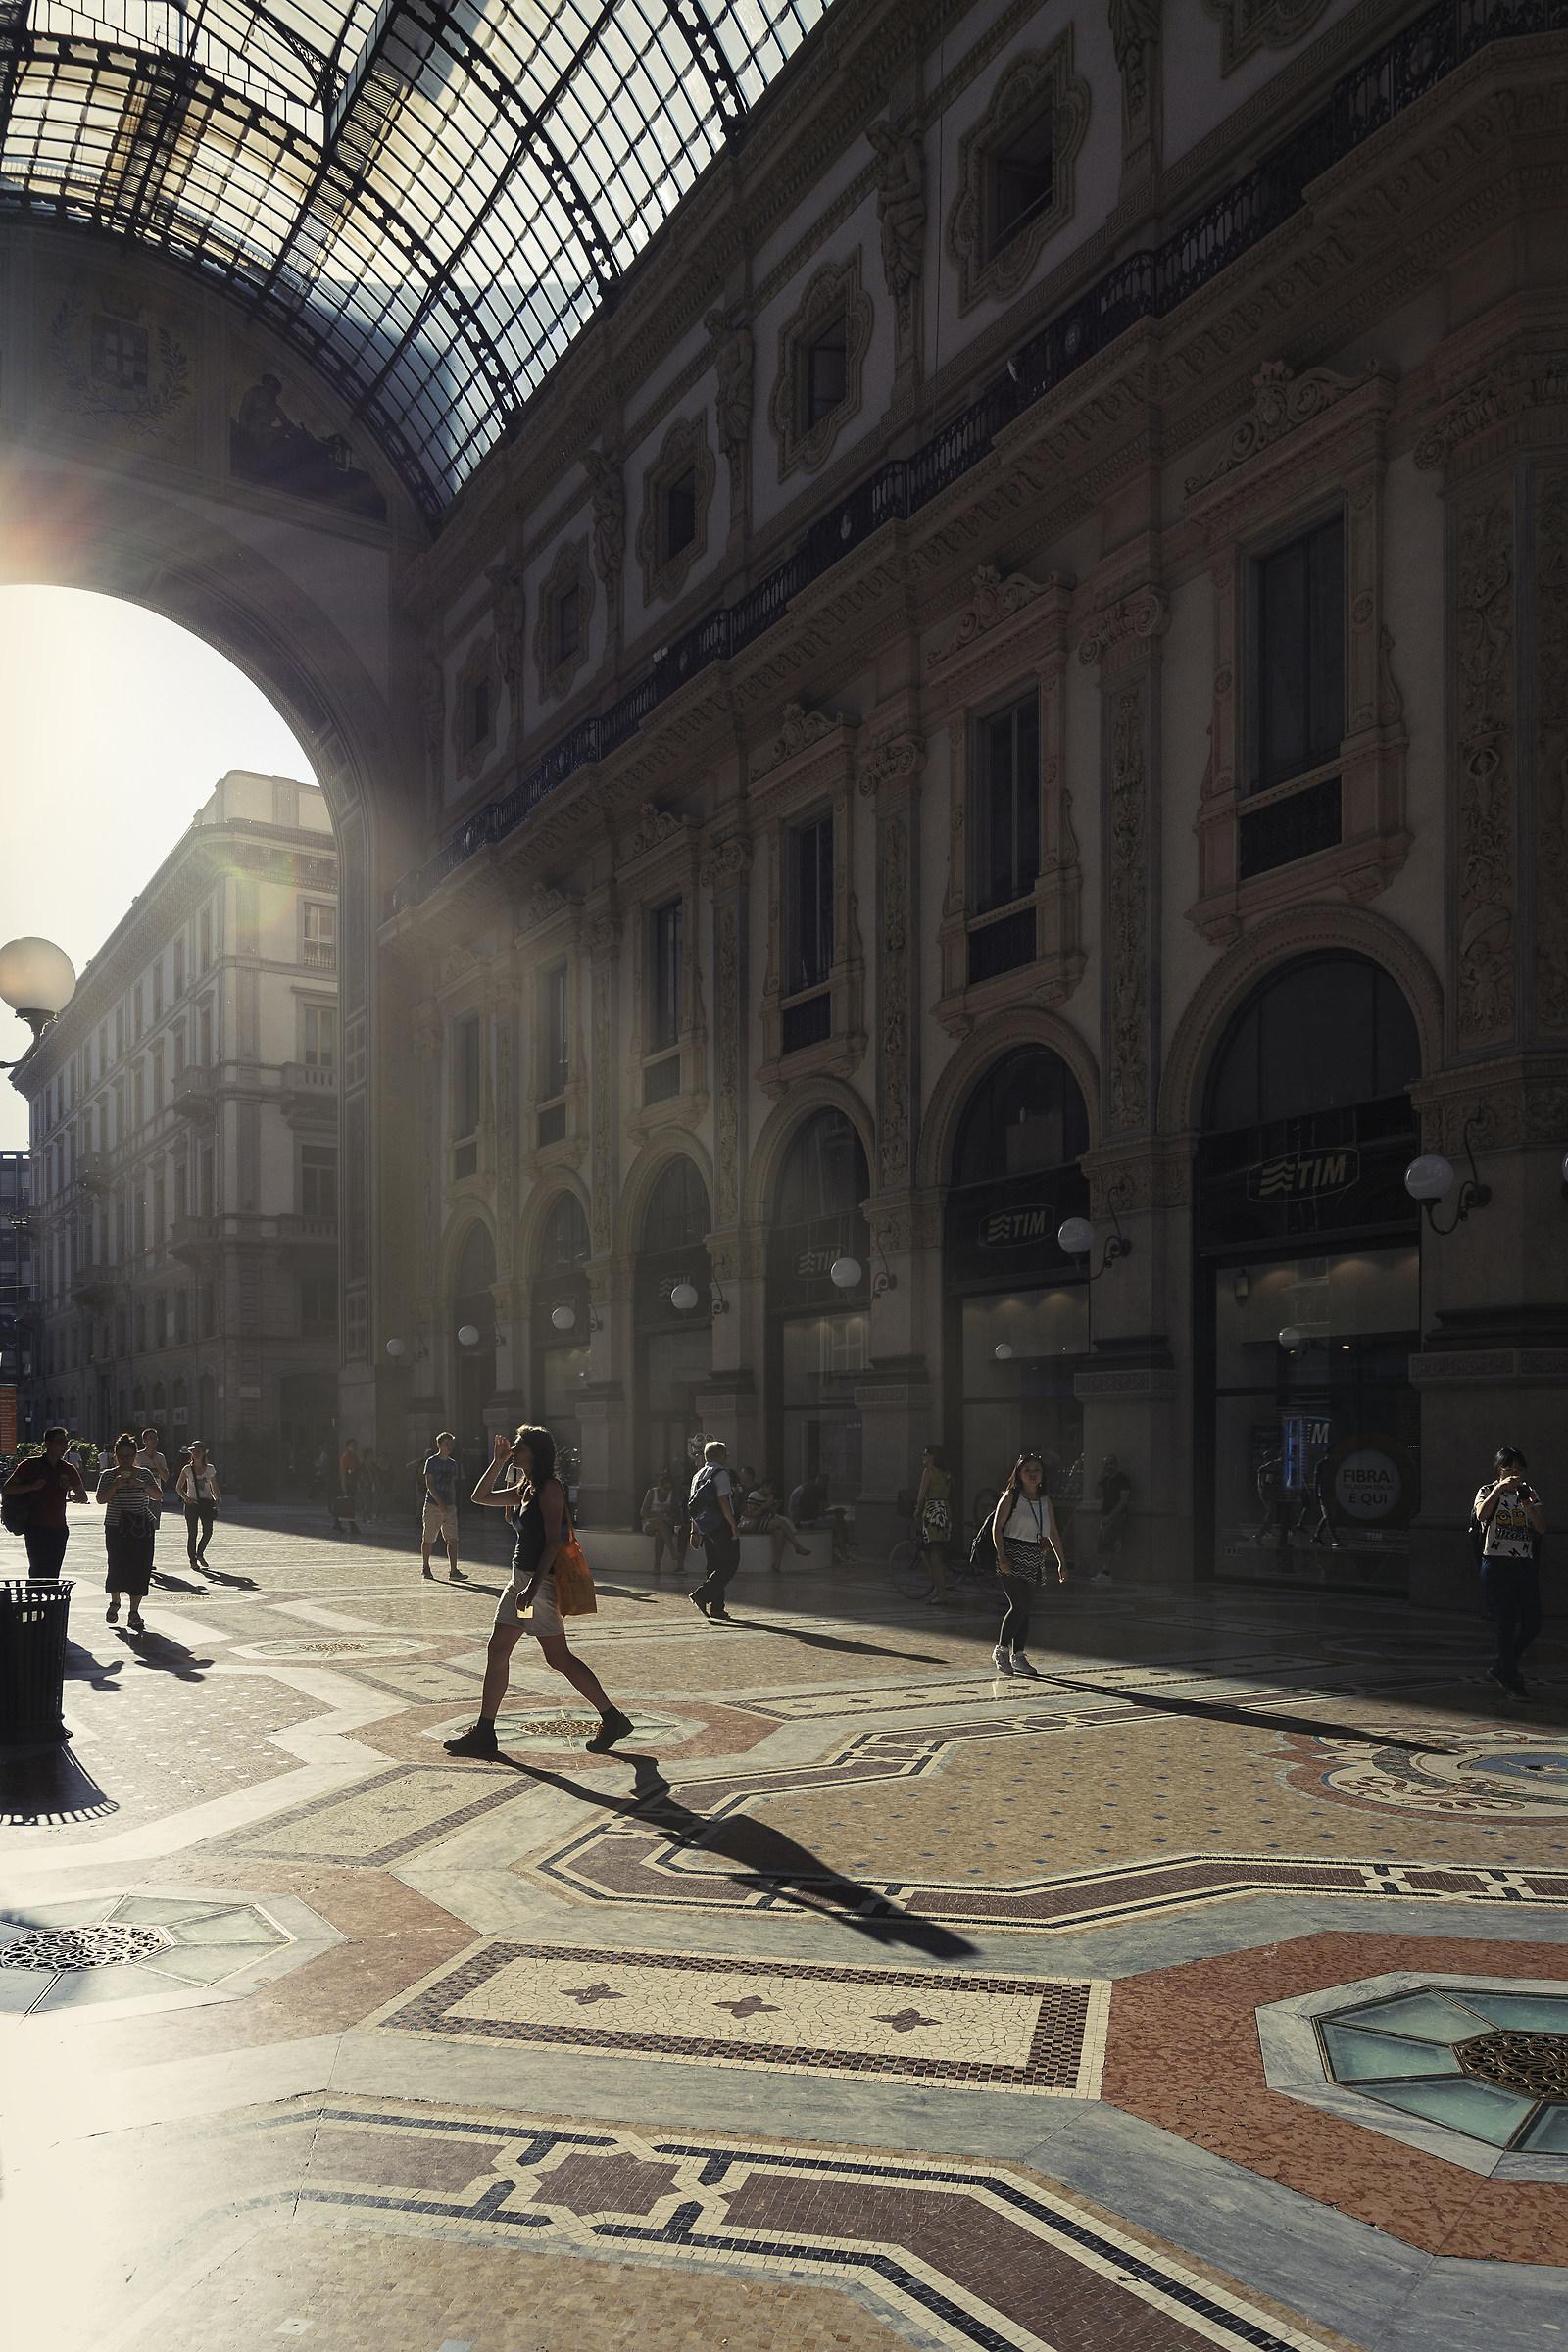 Shadows in gallery...